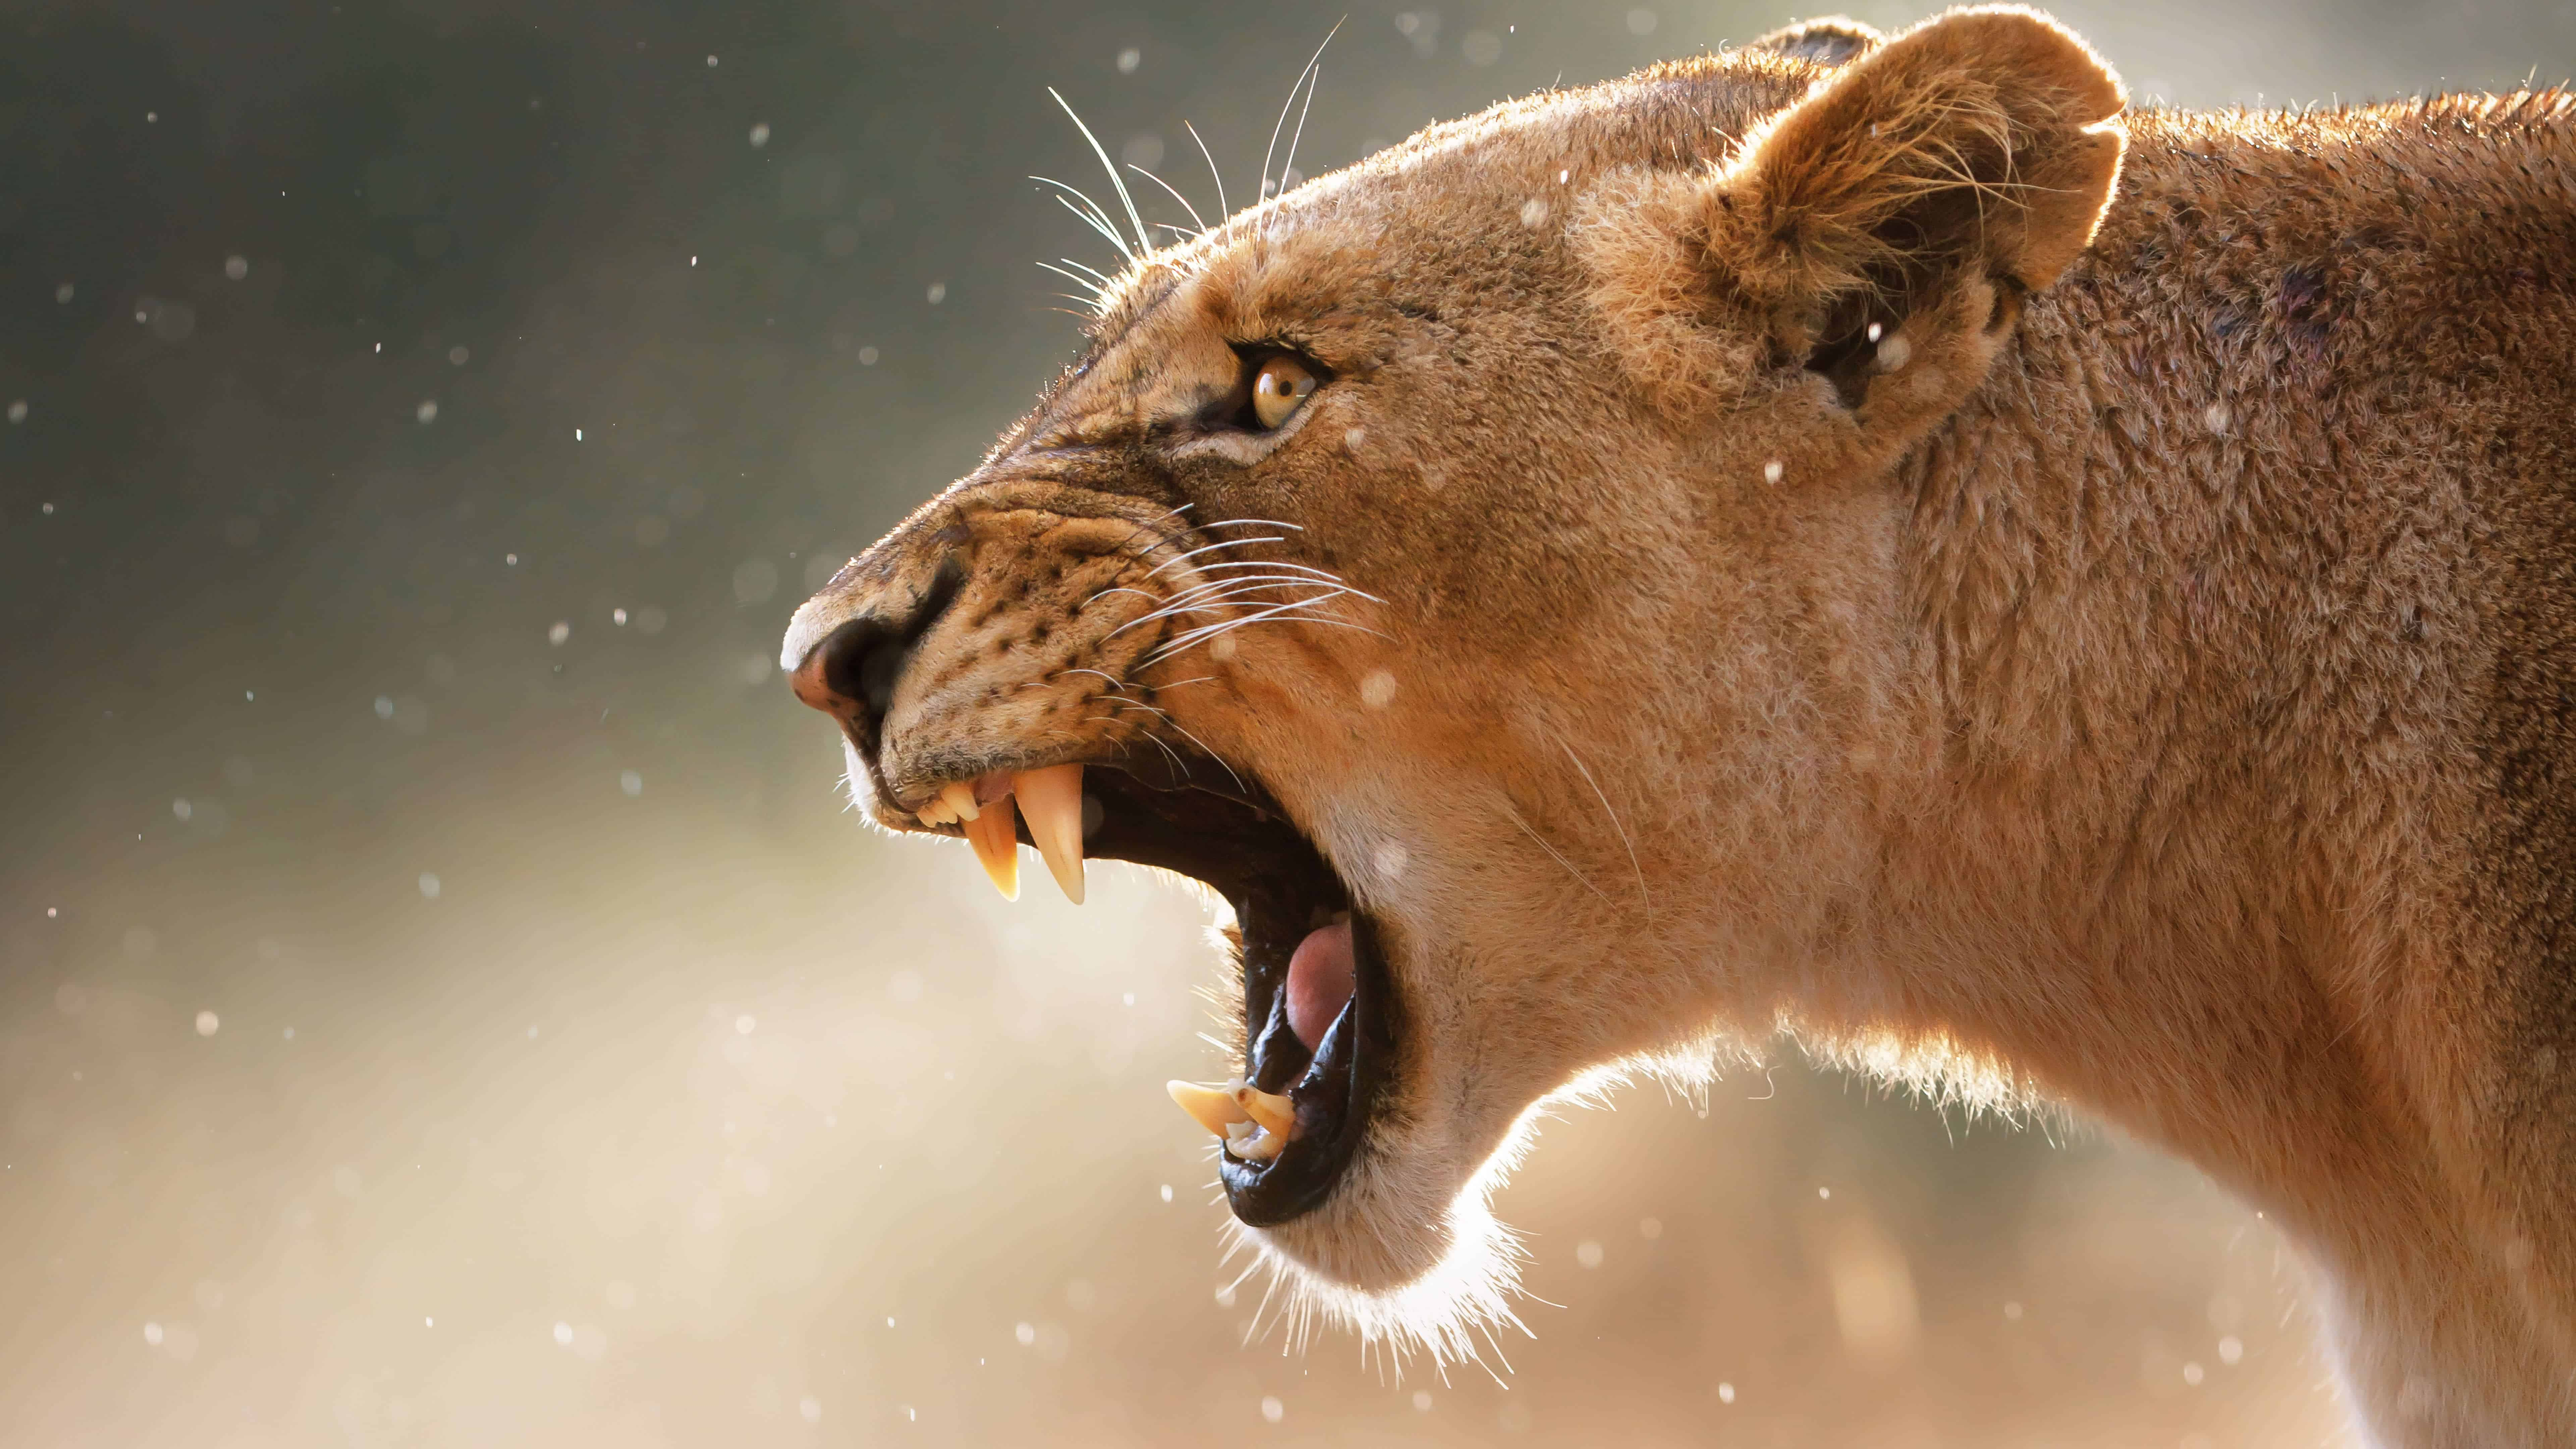 Angry Female Lion Uhd 8k Wallpaper Pixelz